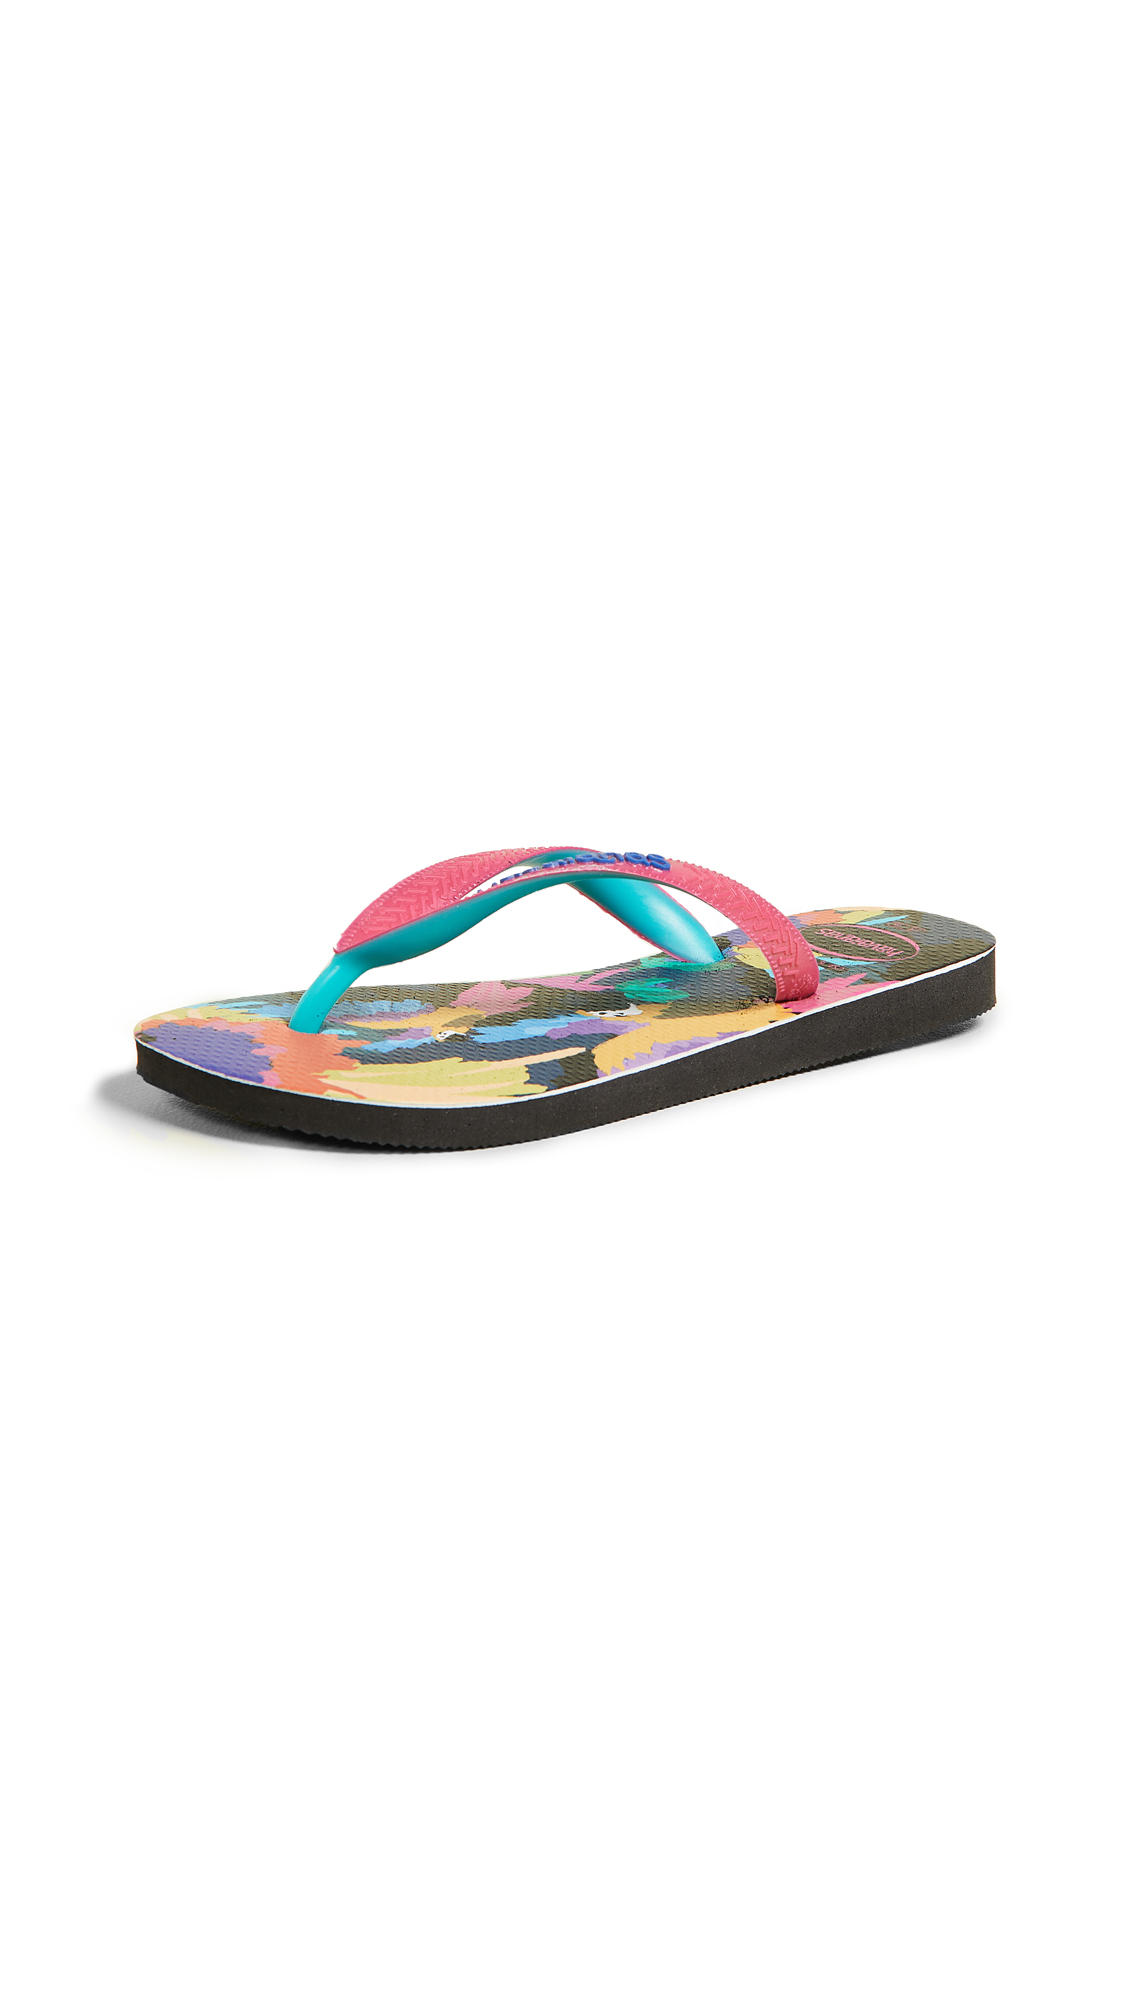 Havaianas Fashion Flip Flops - Black